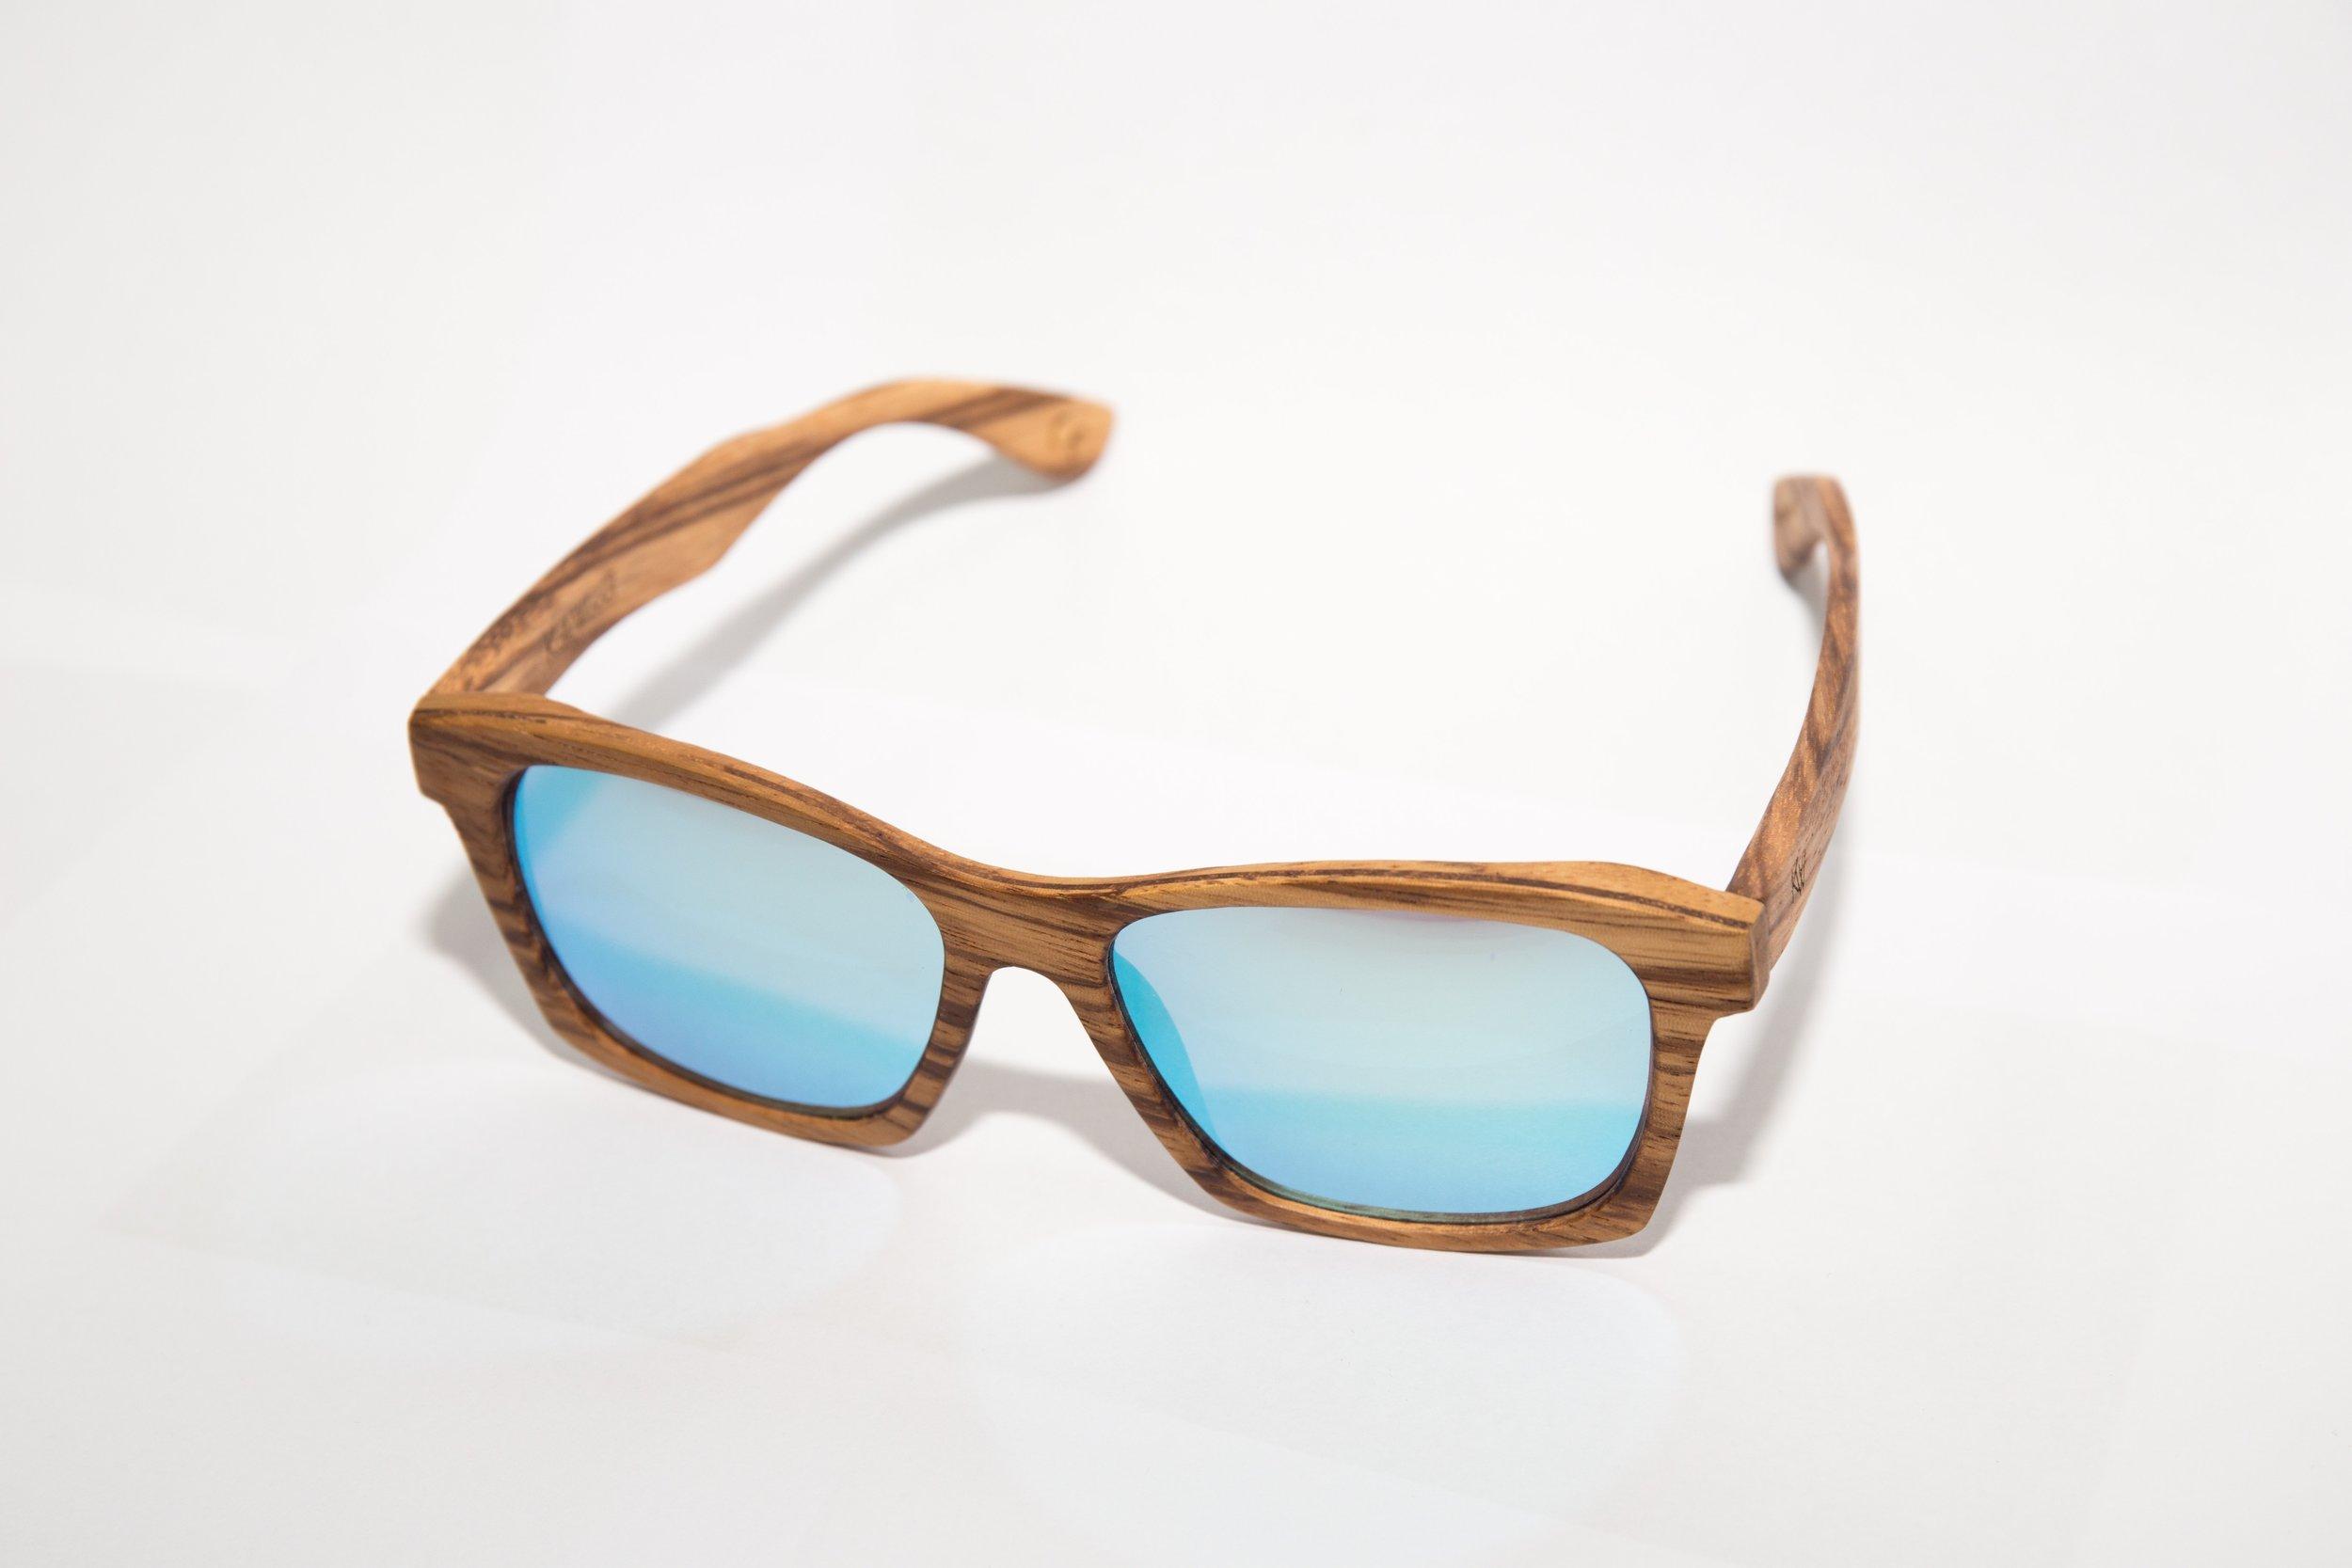 accessory-eyewear-fashionable-1362558.jpg